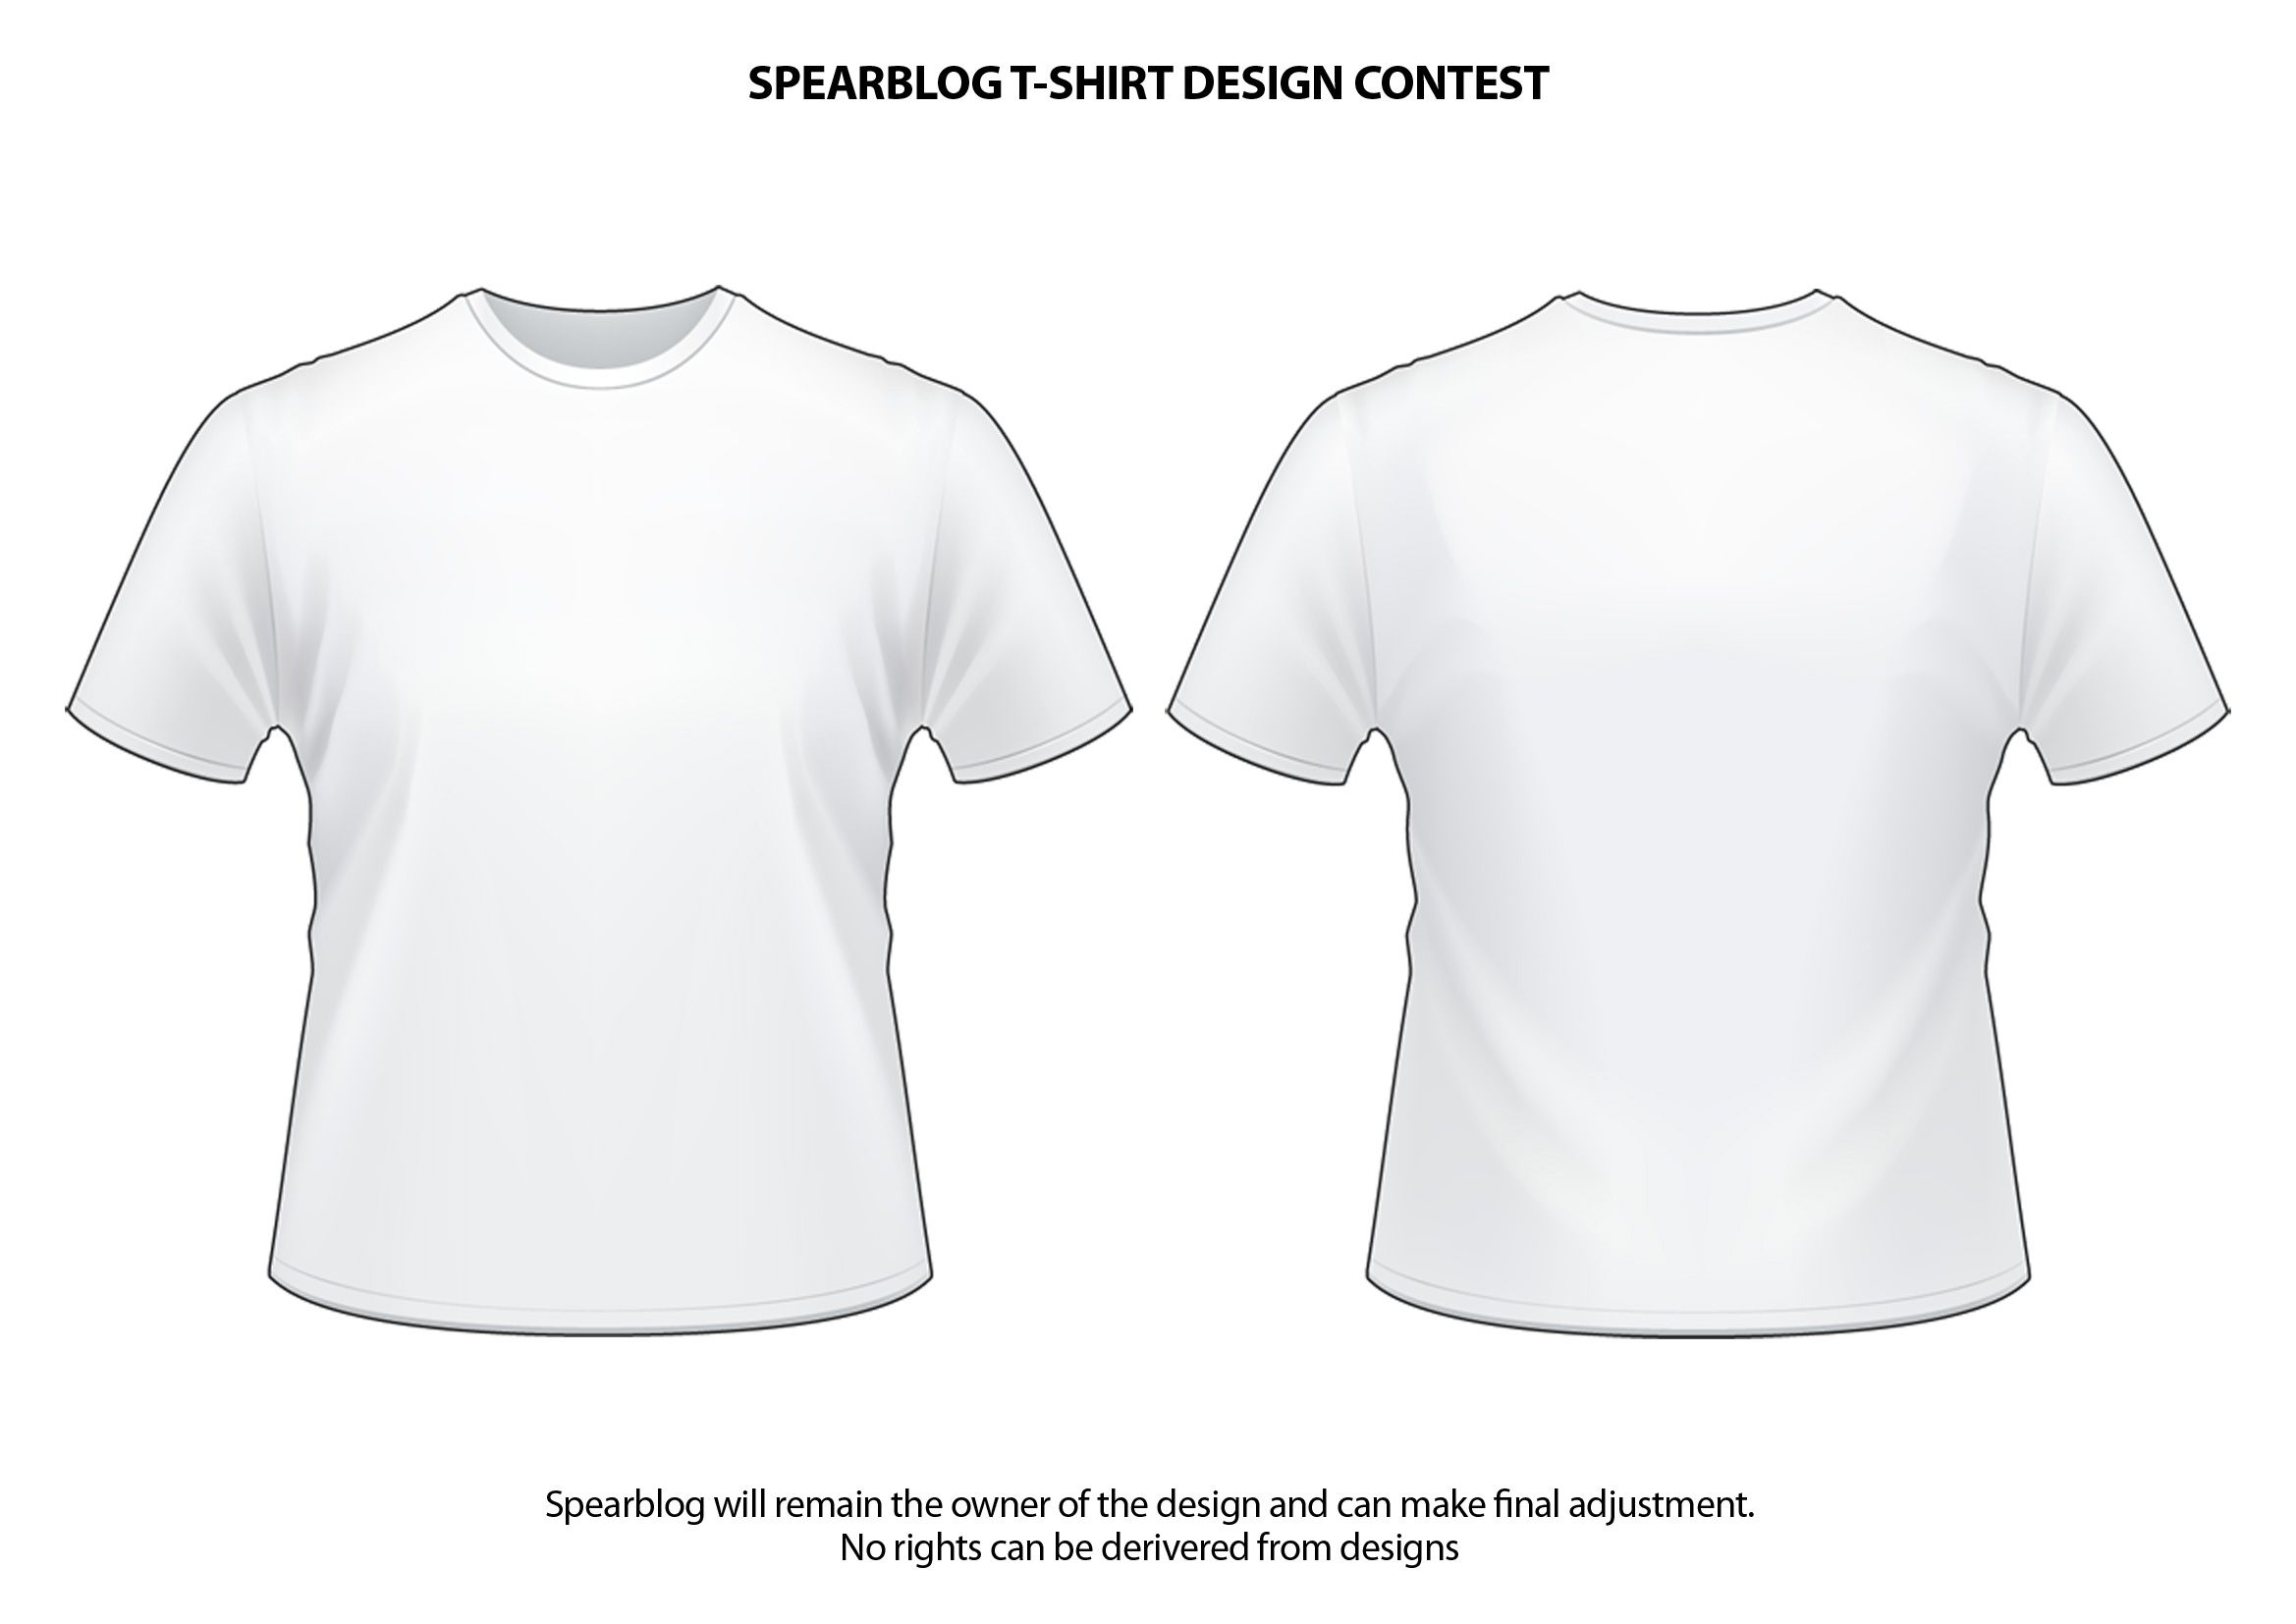 White t shirt design ideas woman white t shirt cool design a girl white t